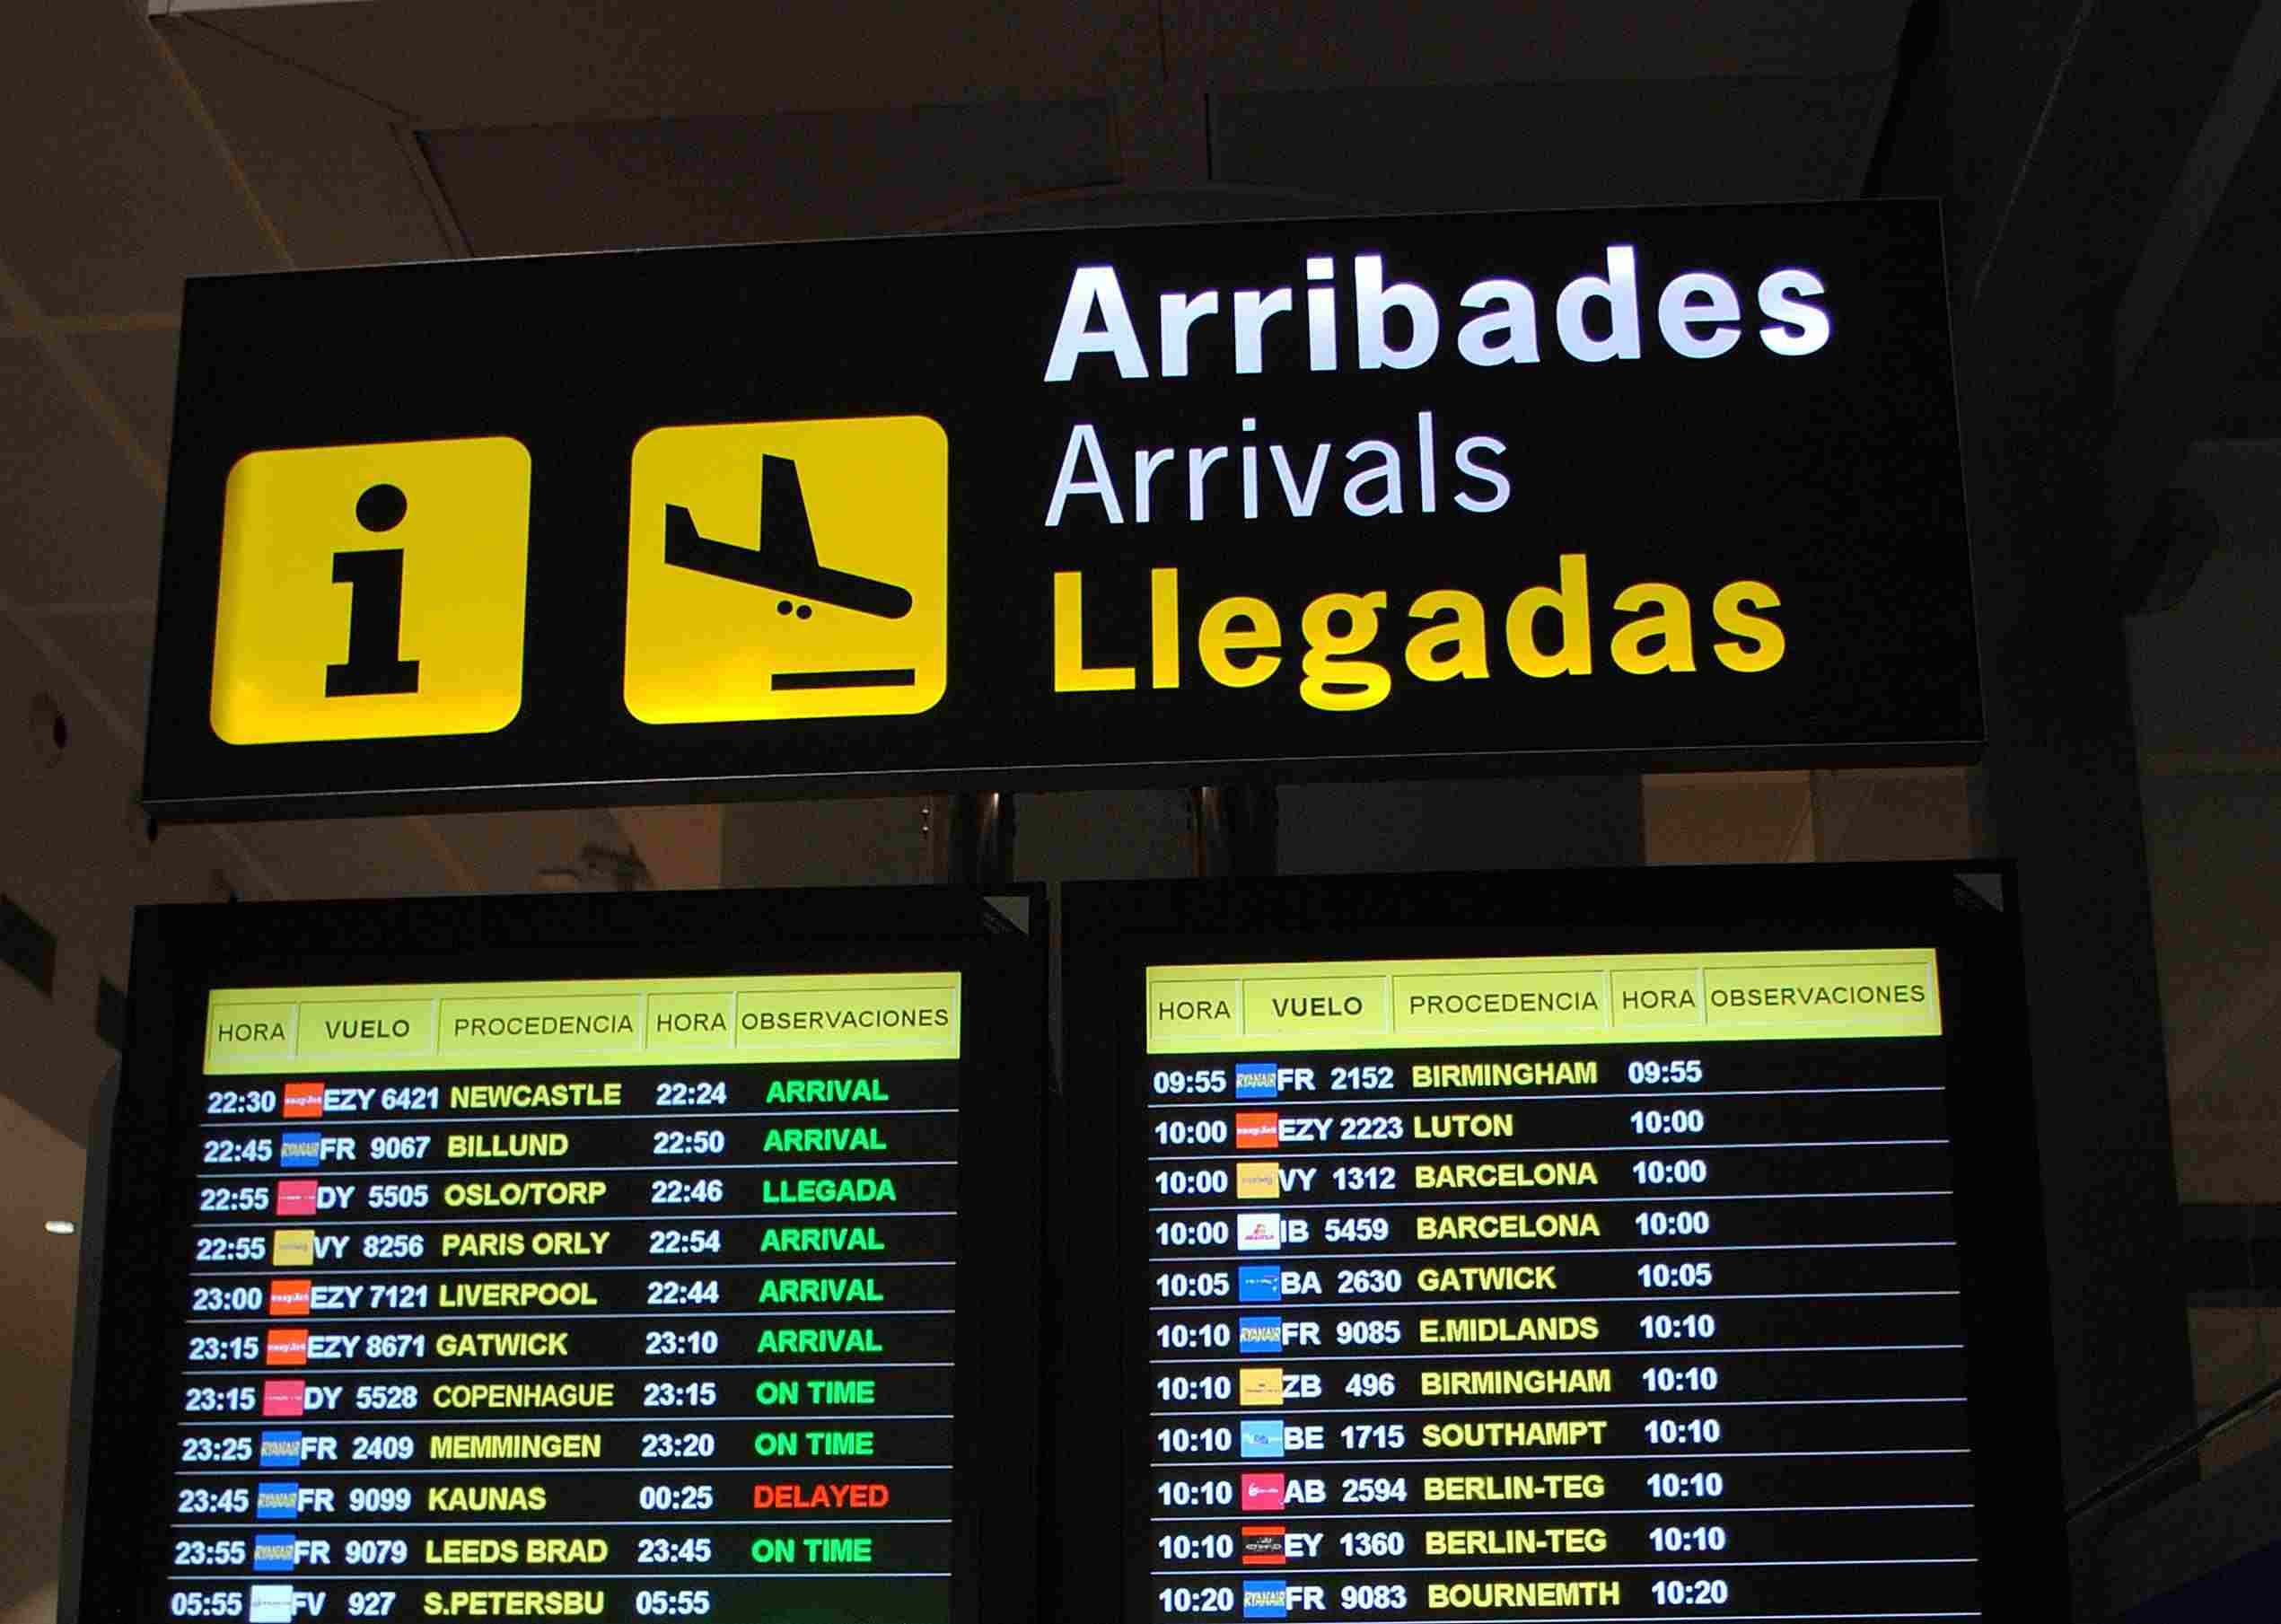 airport in Barcelona, Spain